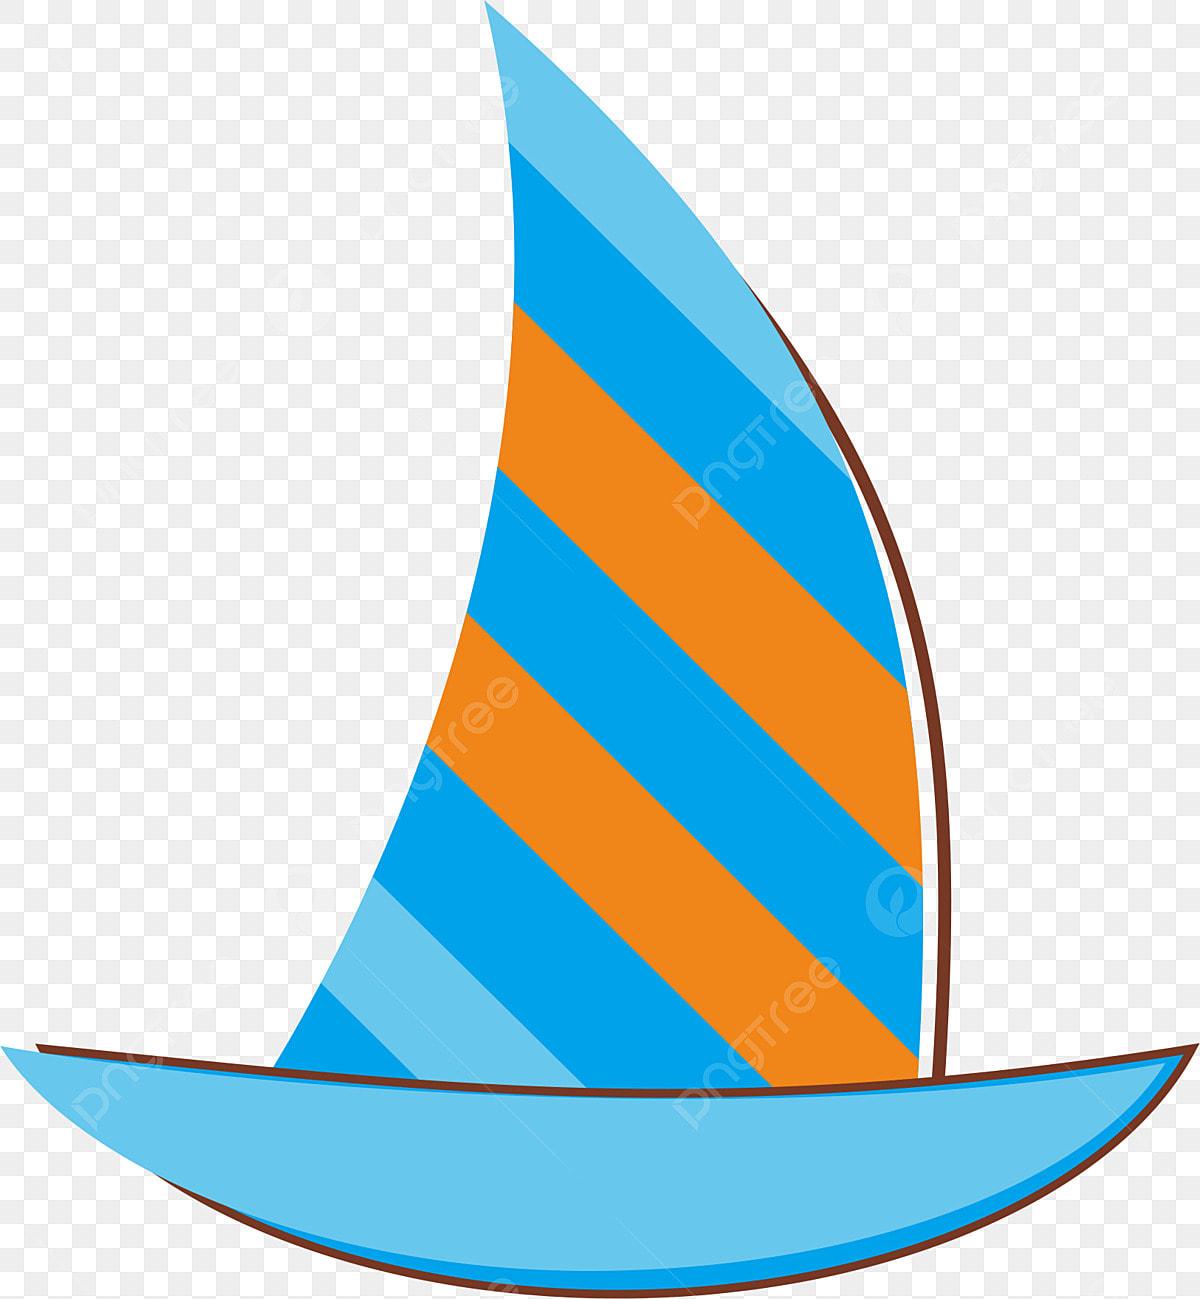 Barco Dos Desenhos Animados Pintura Dos Desenhos Animados